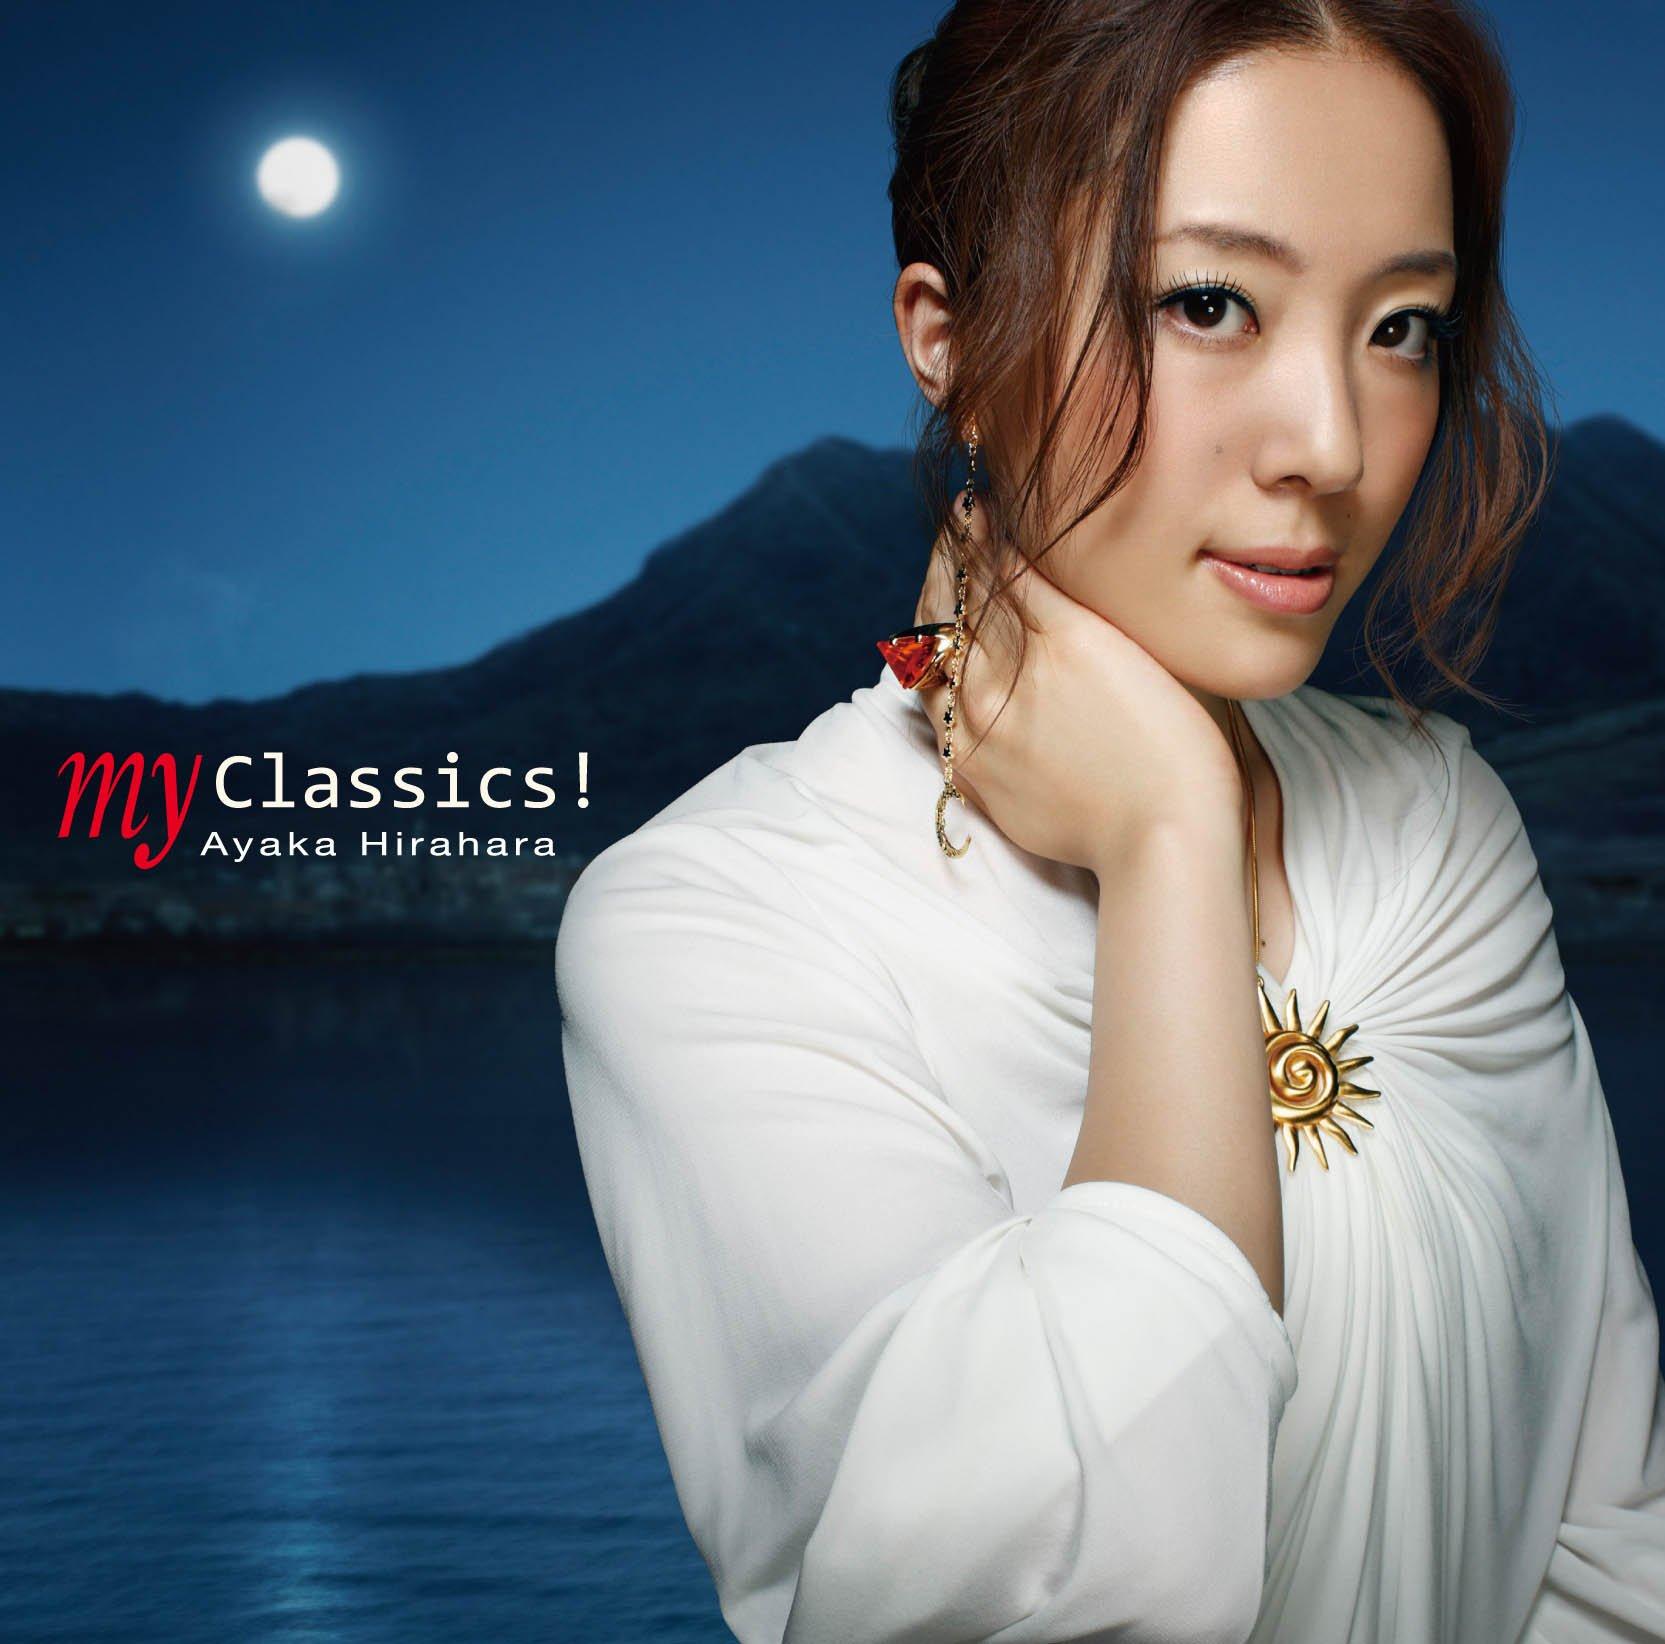 平原綾香 (Ayaka Hirahara) – my Classics! [Mora FLAC 24bit/96kHz]